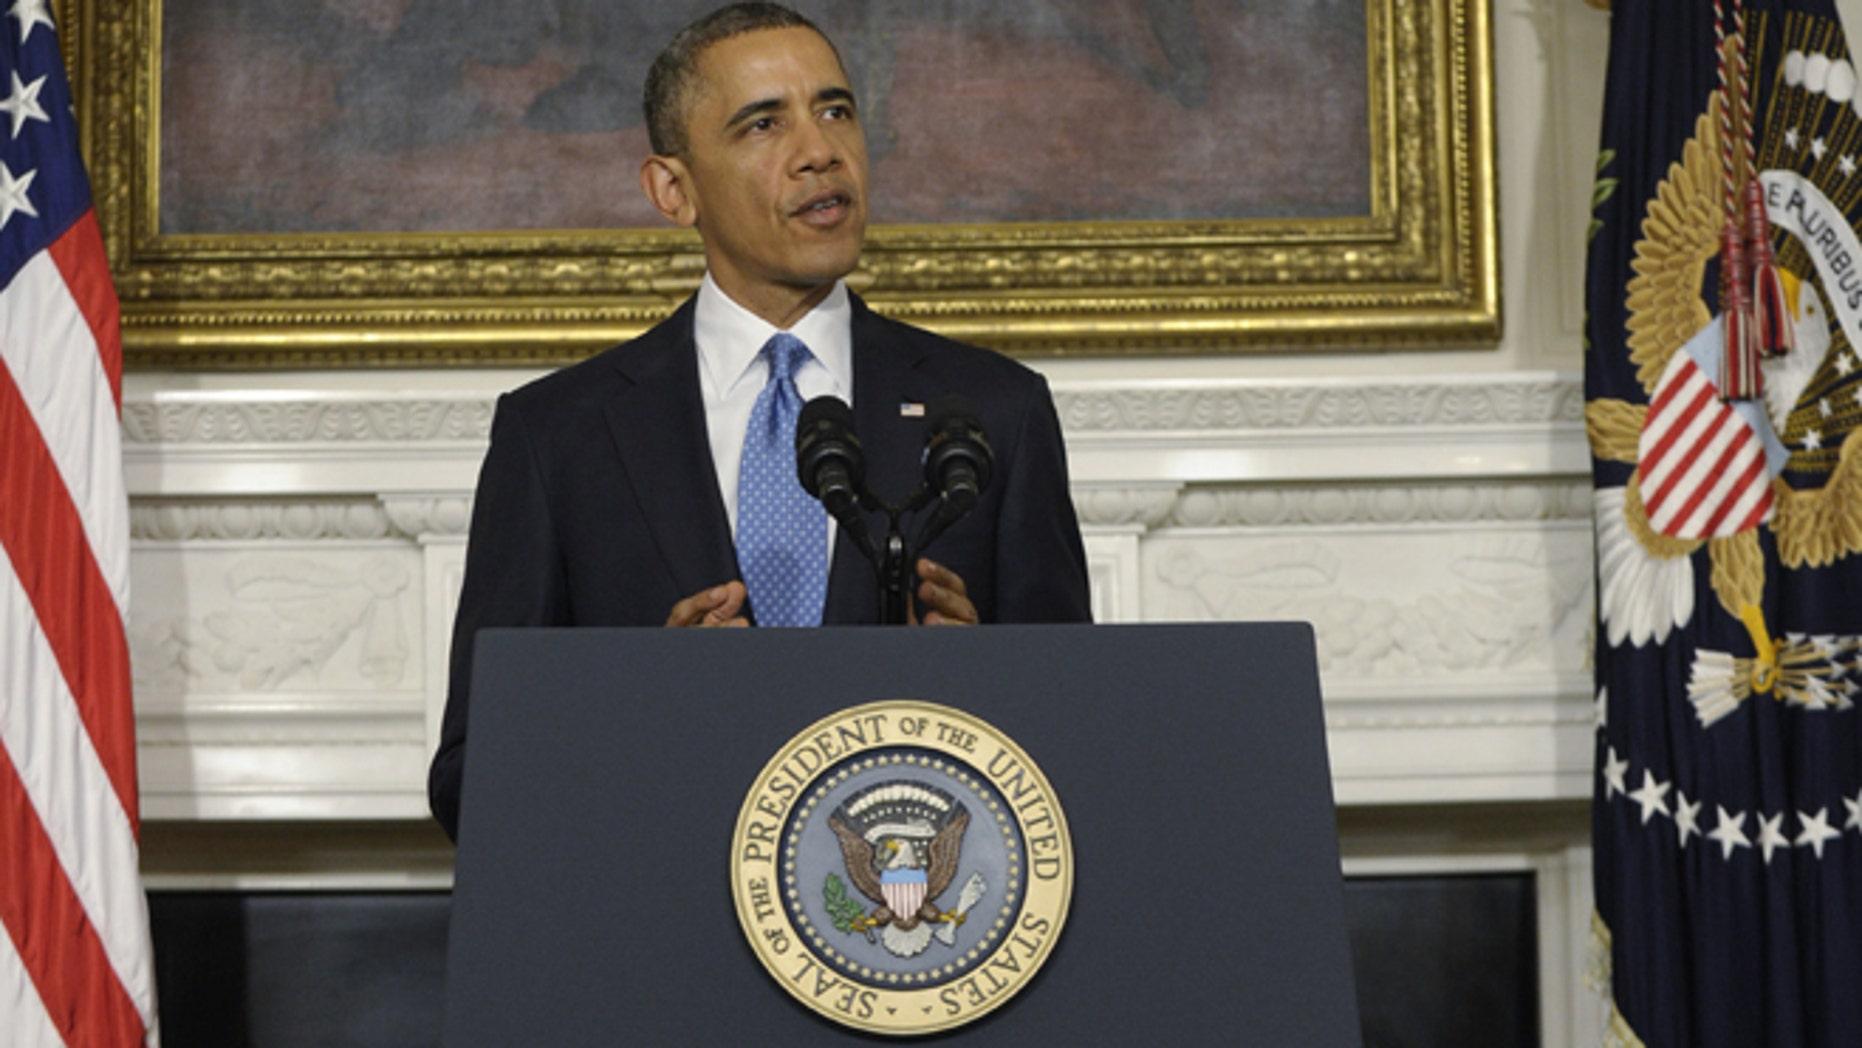 Nov. 23, 2013: President Barack Obama speaks in the State Dining Room at the White House